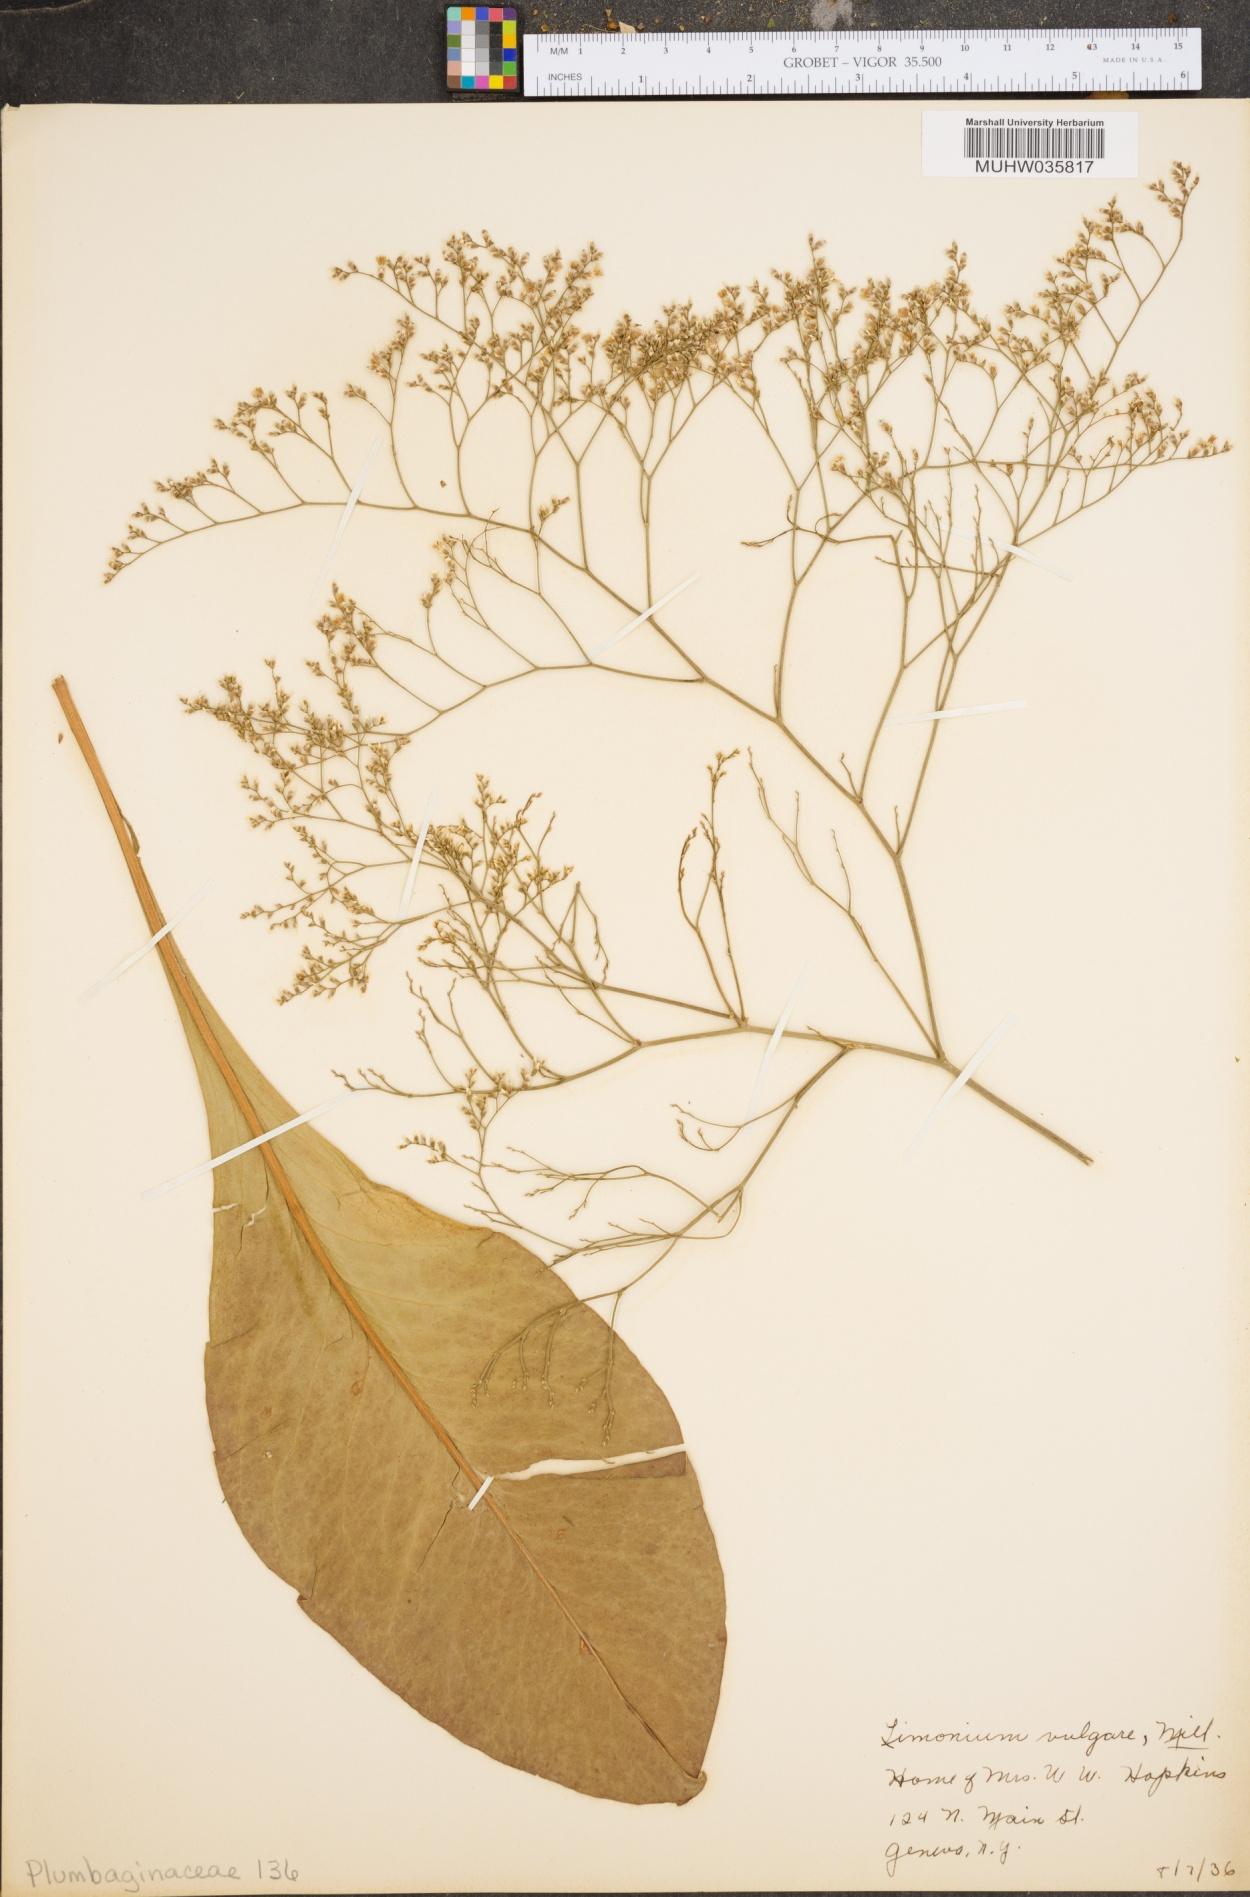 Limonium vulgare image